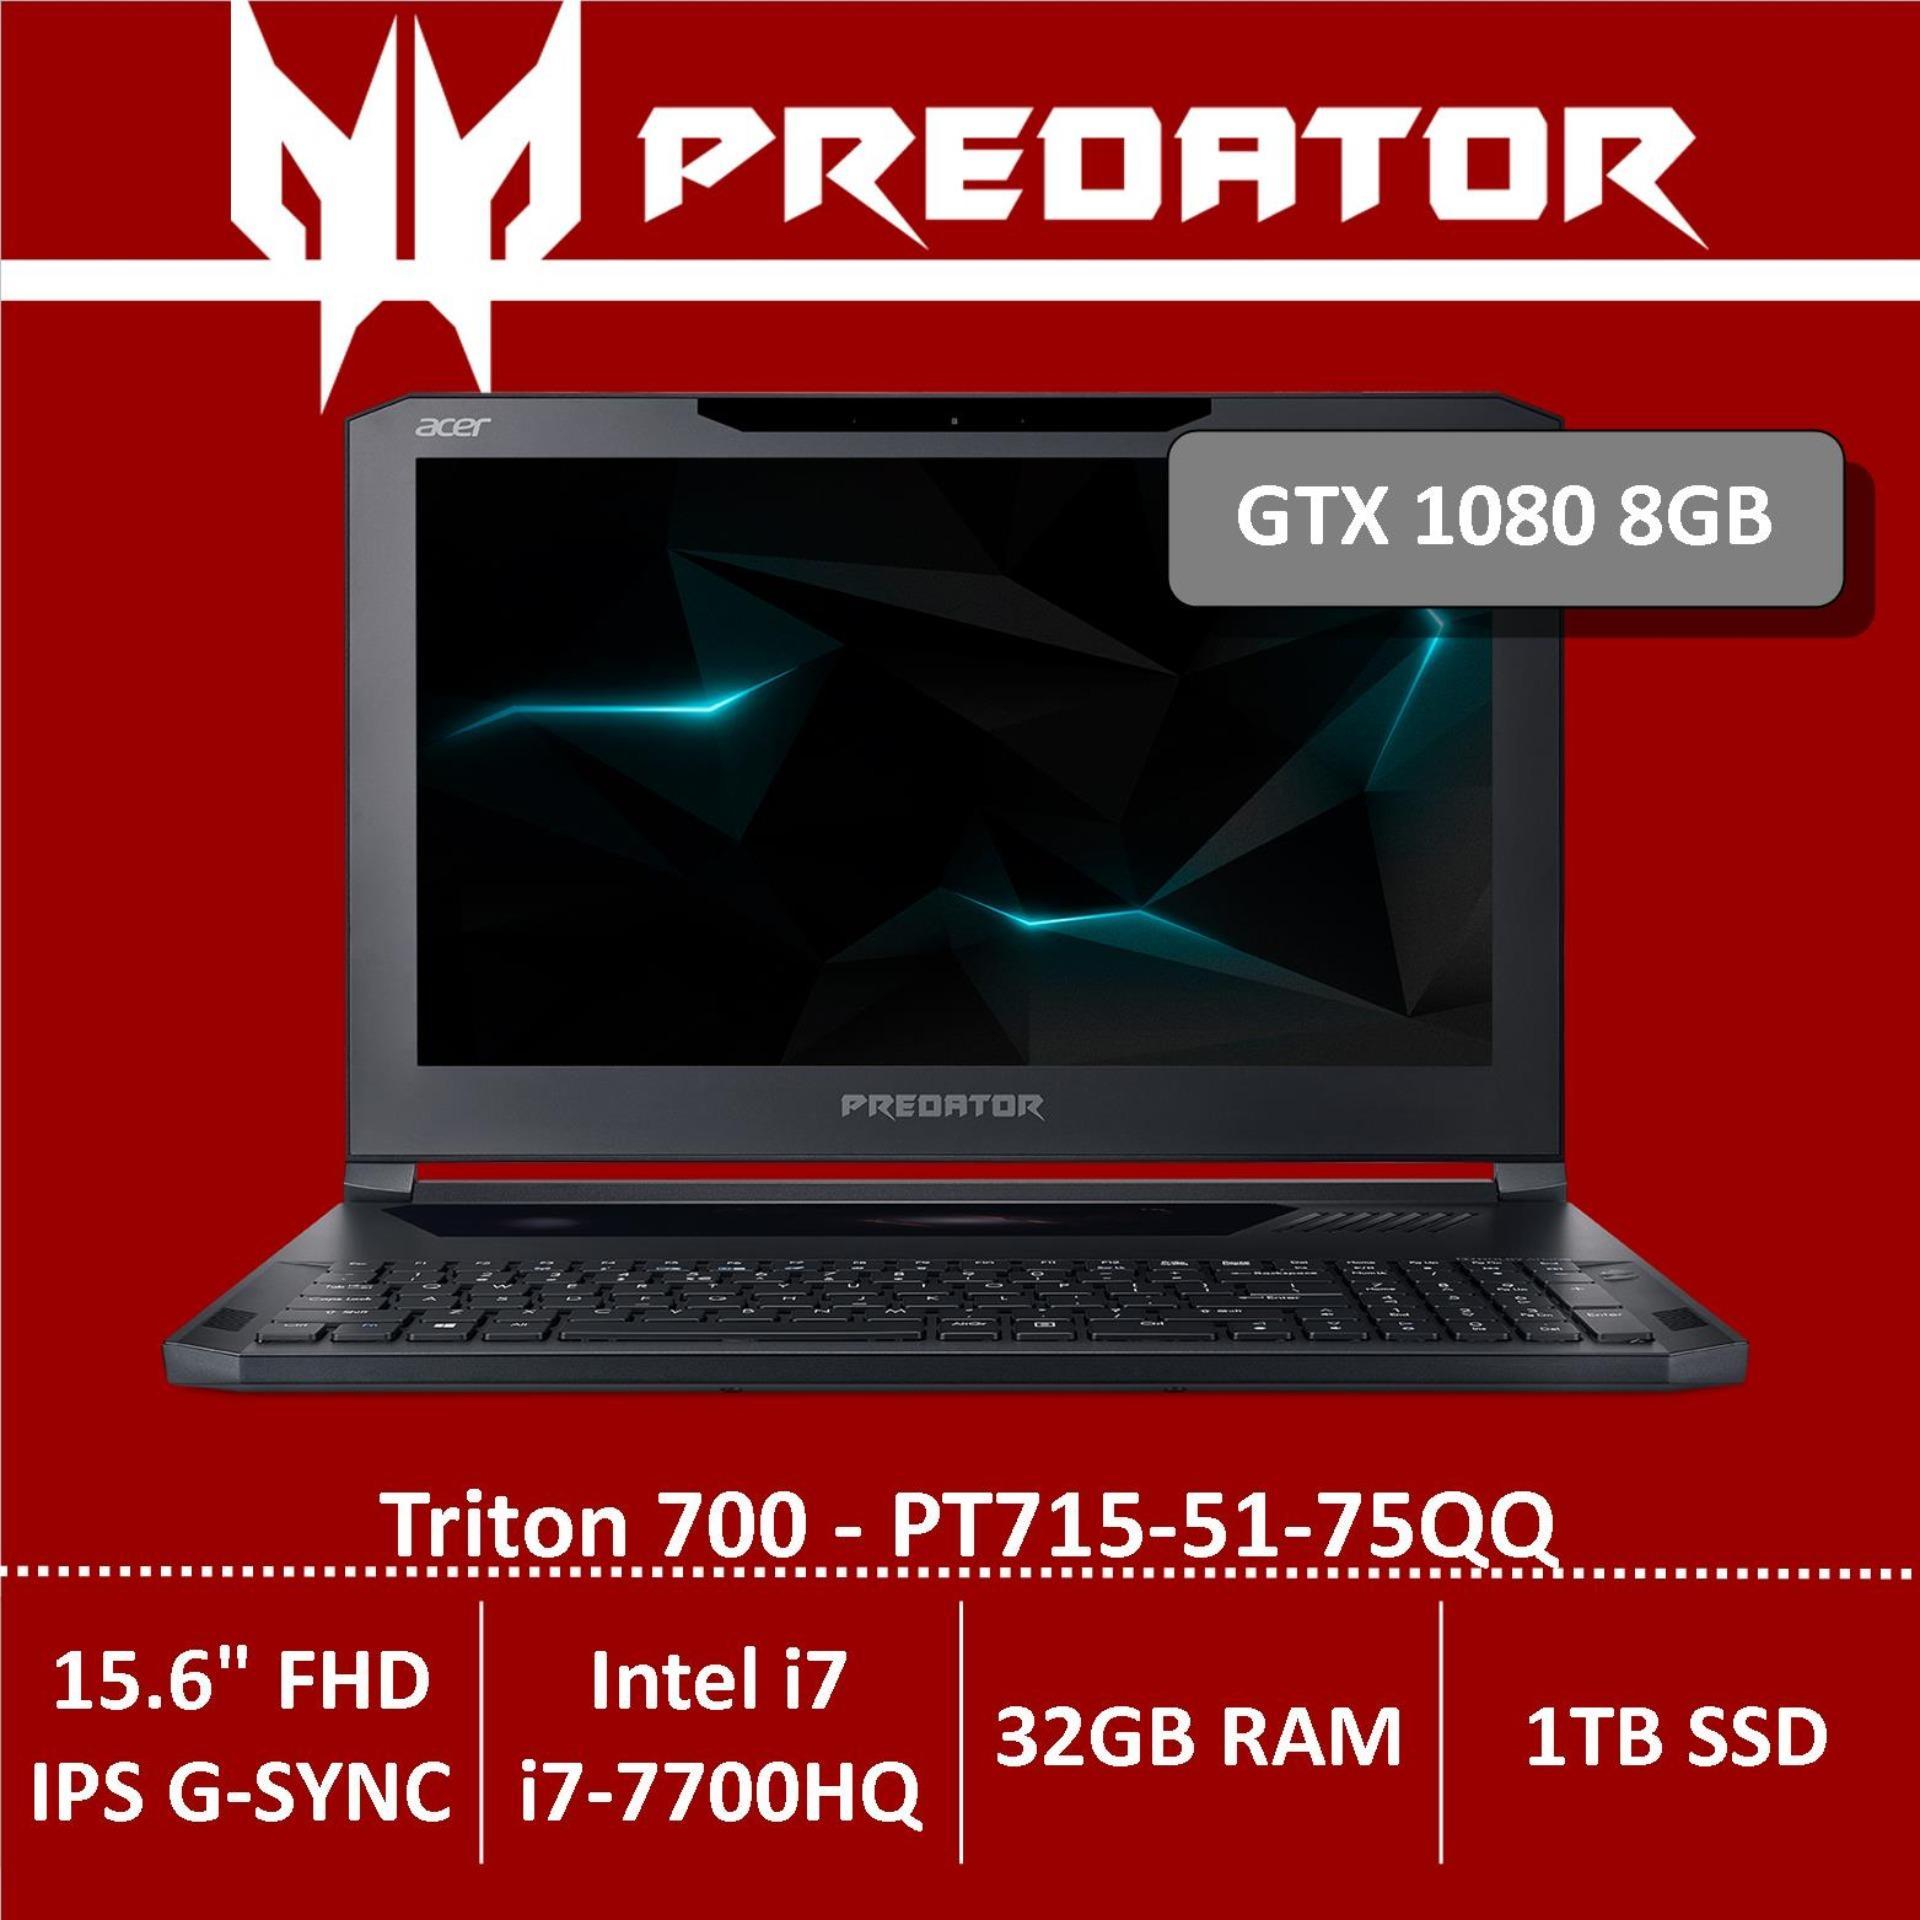 Predator Triton 700 PT715-51-75QQ Gaming Laptop (NVIDIA® GeForce® GTX 1080 with MAX-Q design and with 8 GB of dedicated GDDR5X VRAM)